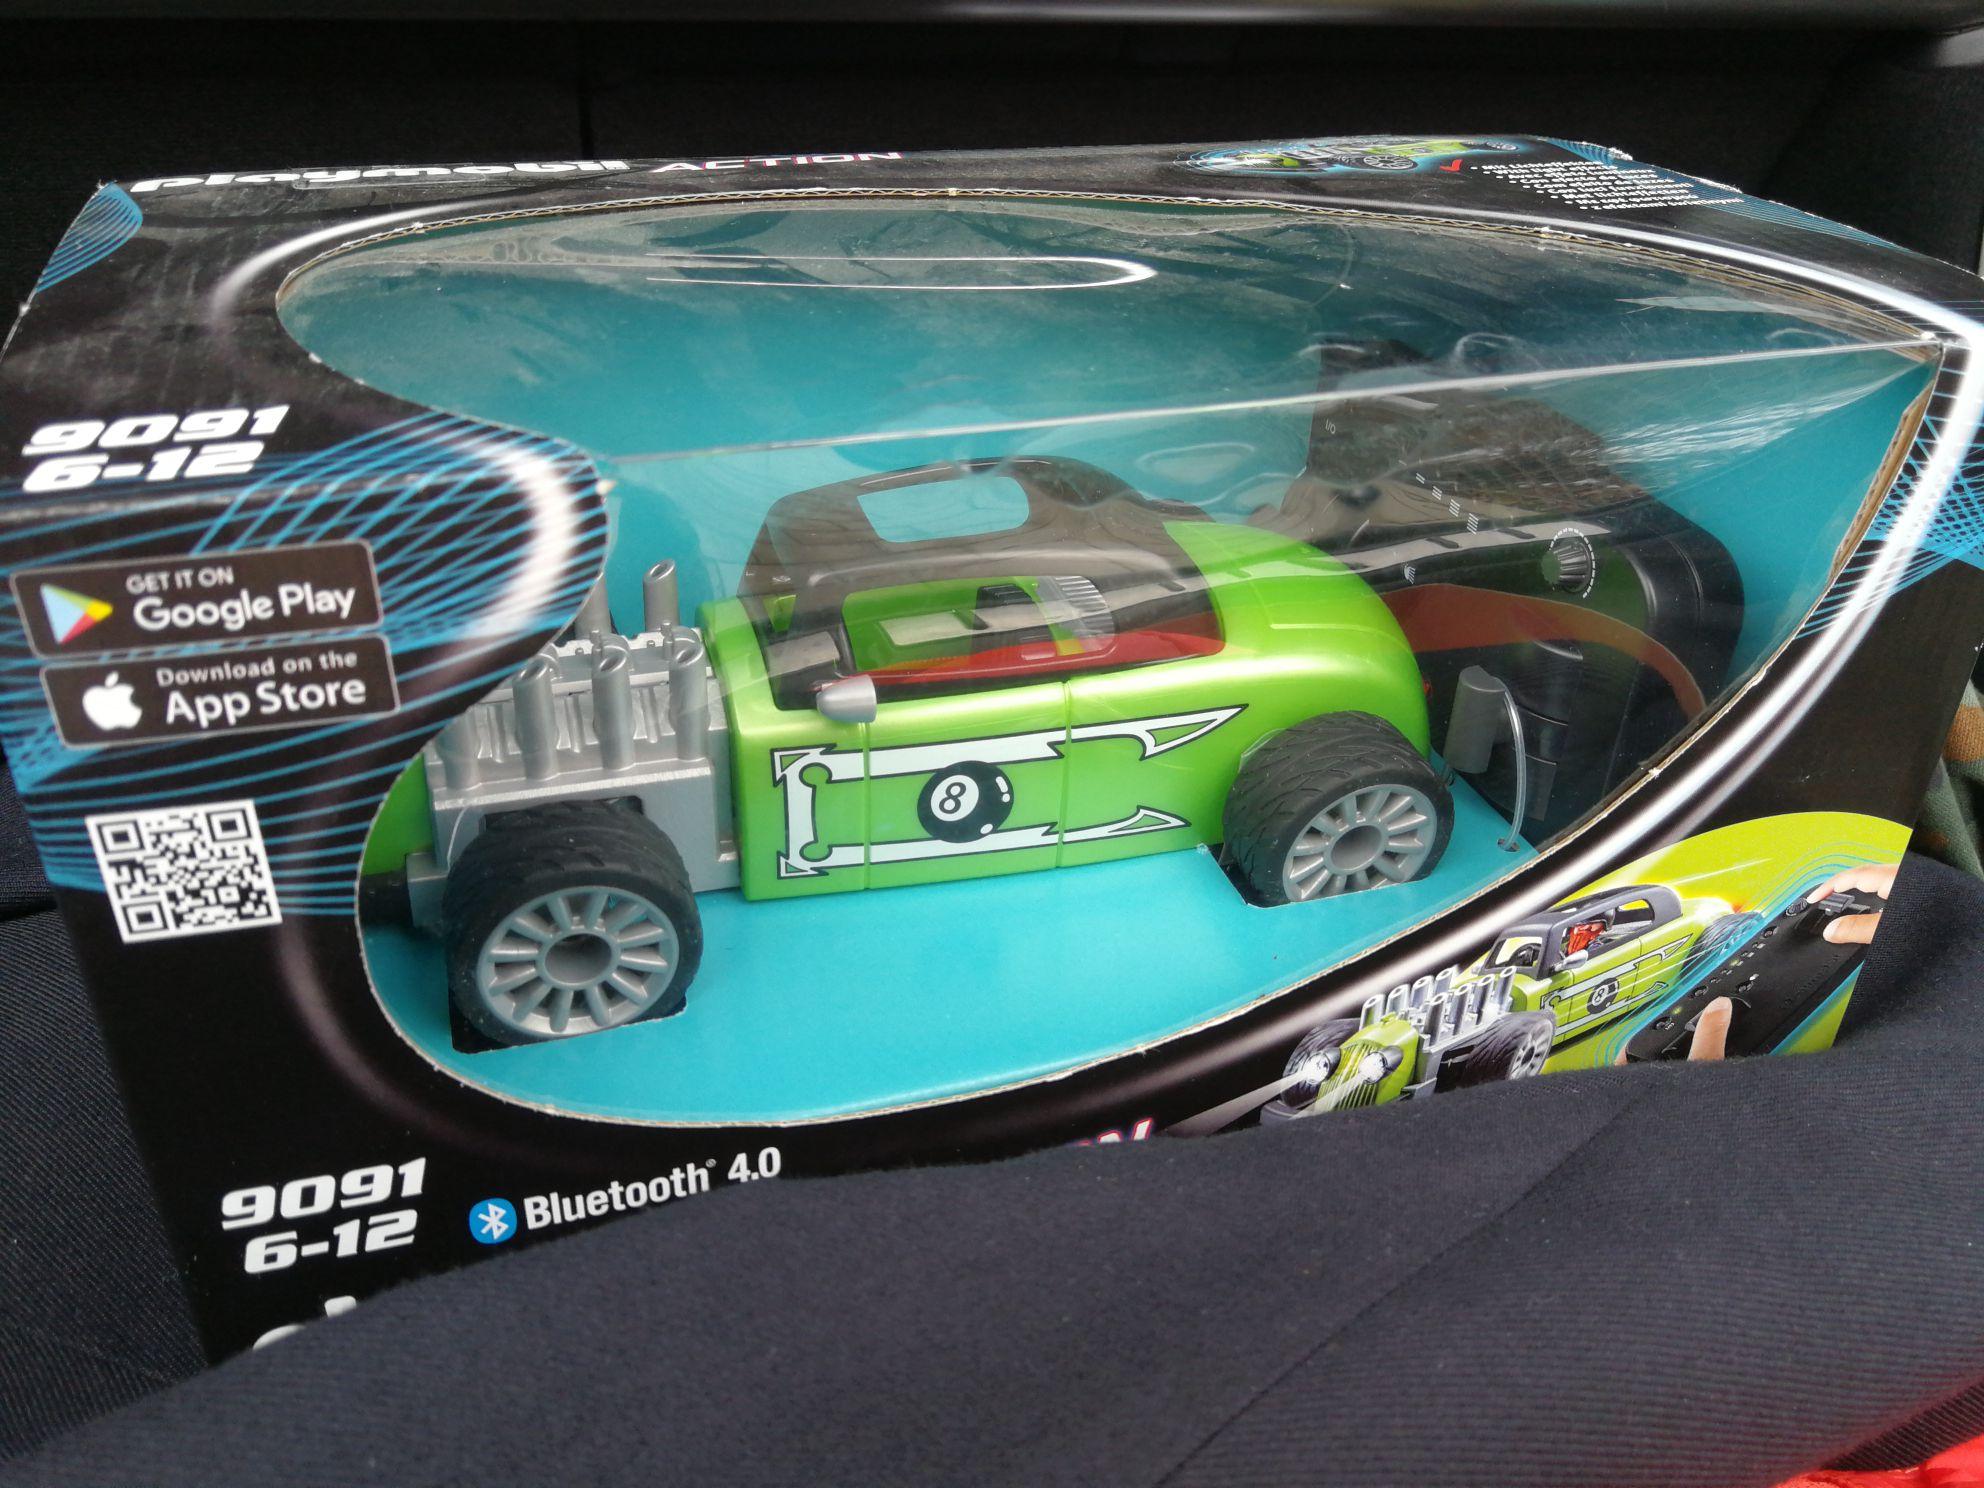 Playmobil RC Racer Rock n' Roll (Globus Koblenz)